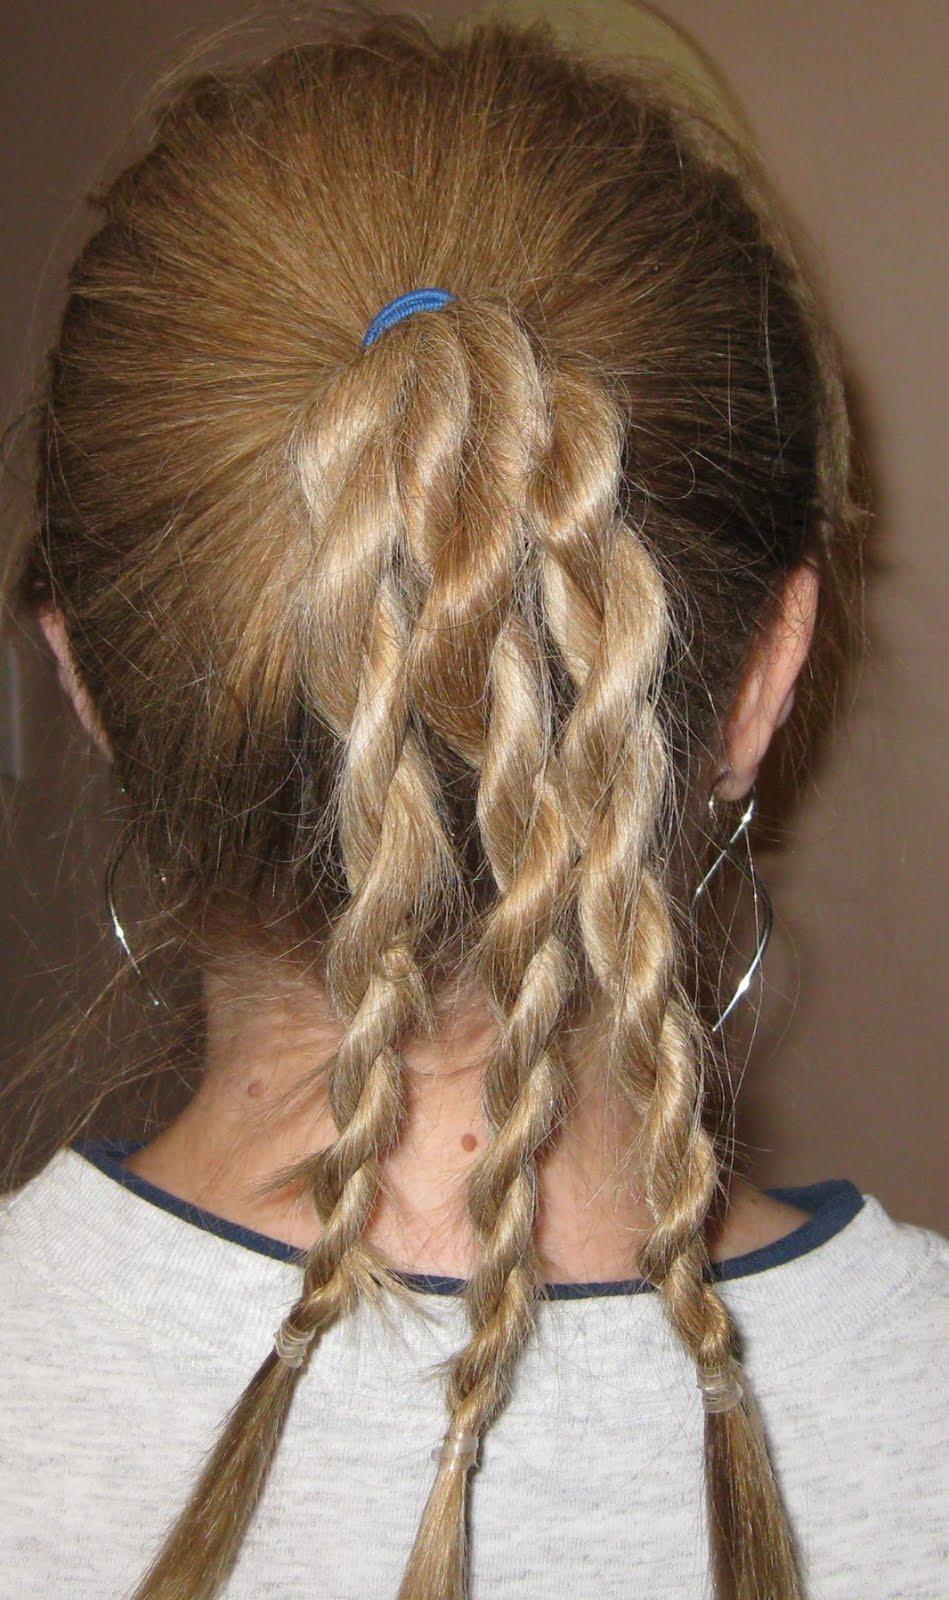 Rope Braid Hair Instructions